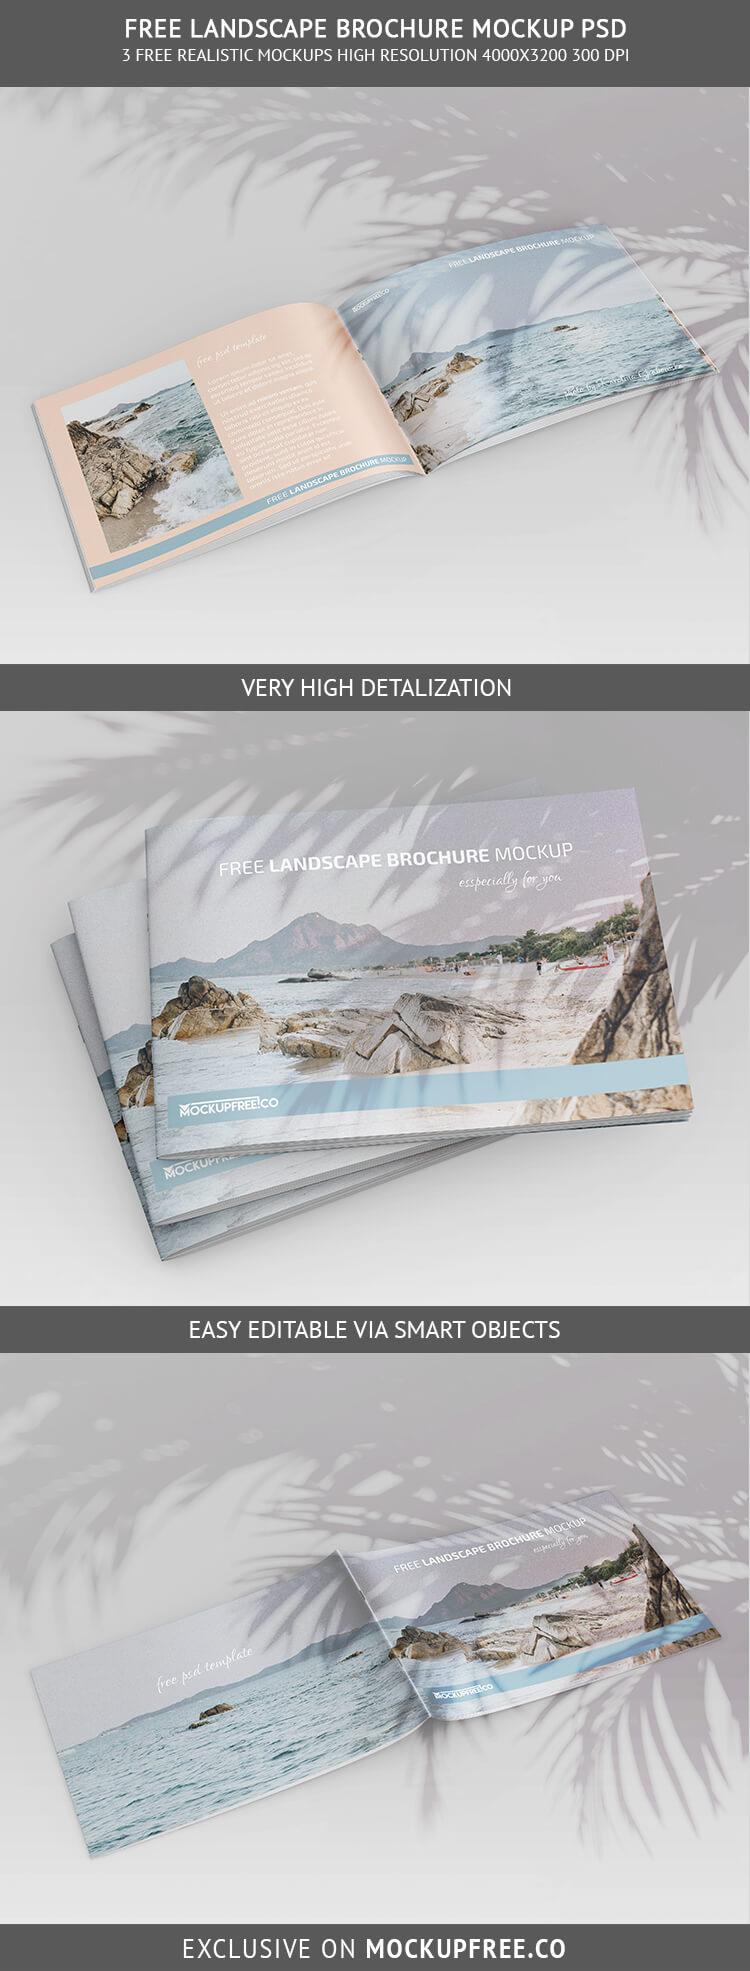 Free Landscape Brochure Mockup in PSD